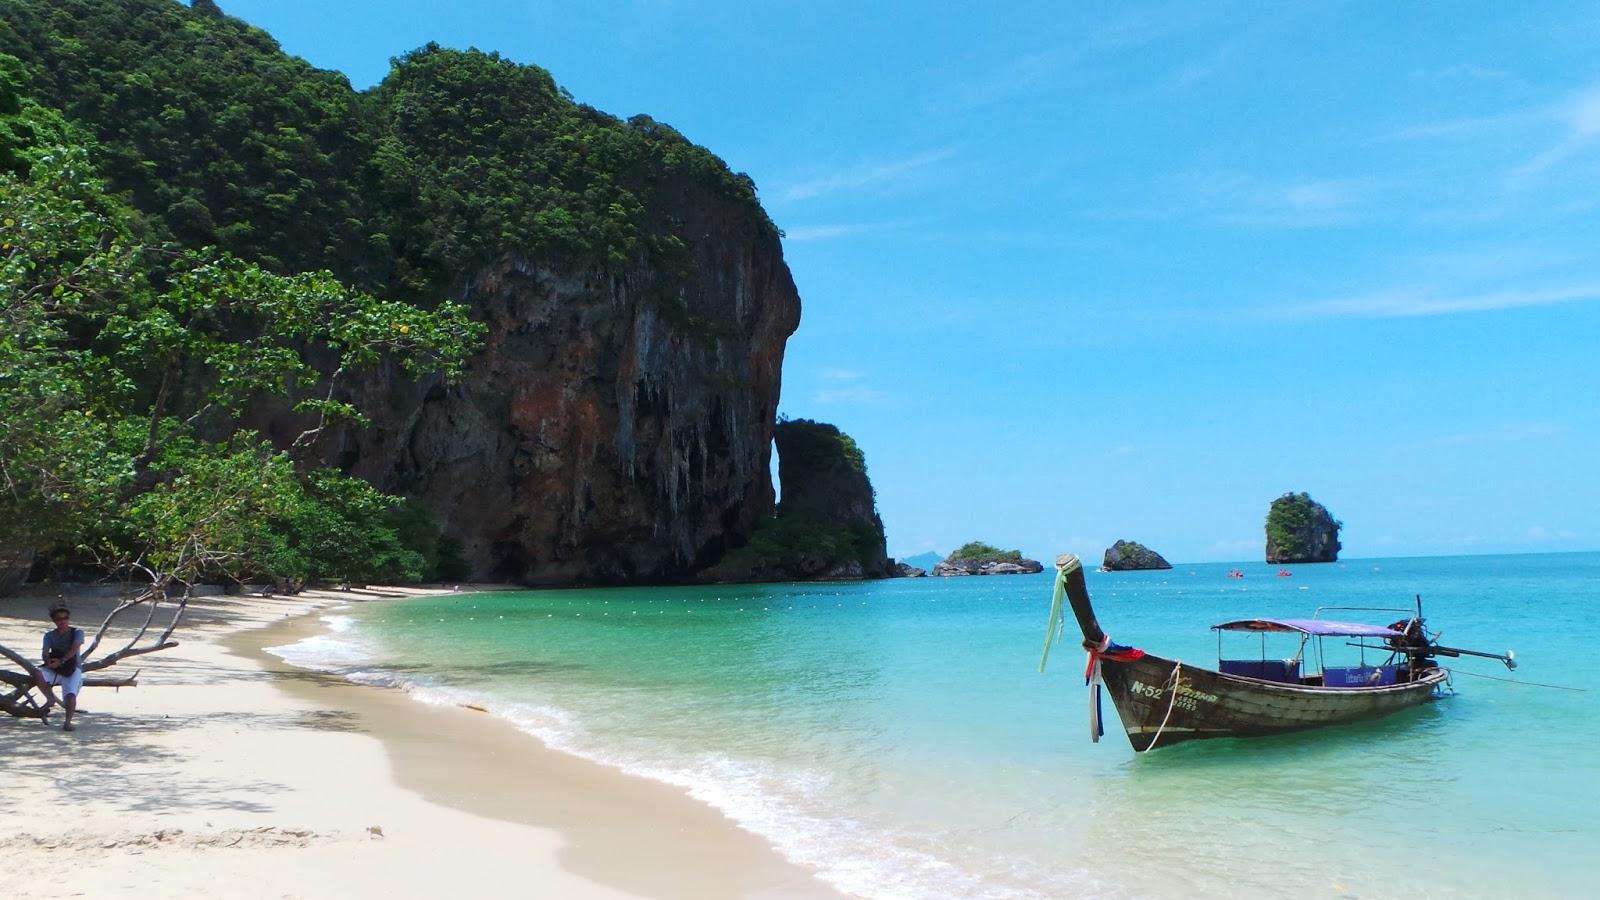 Benetone Films Blog: Thailand Location Series: Beaches